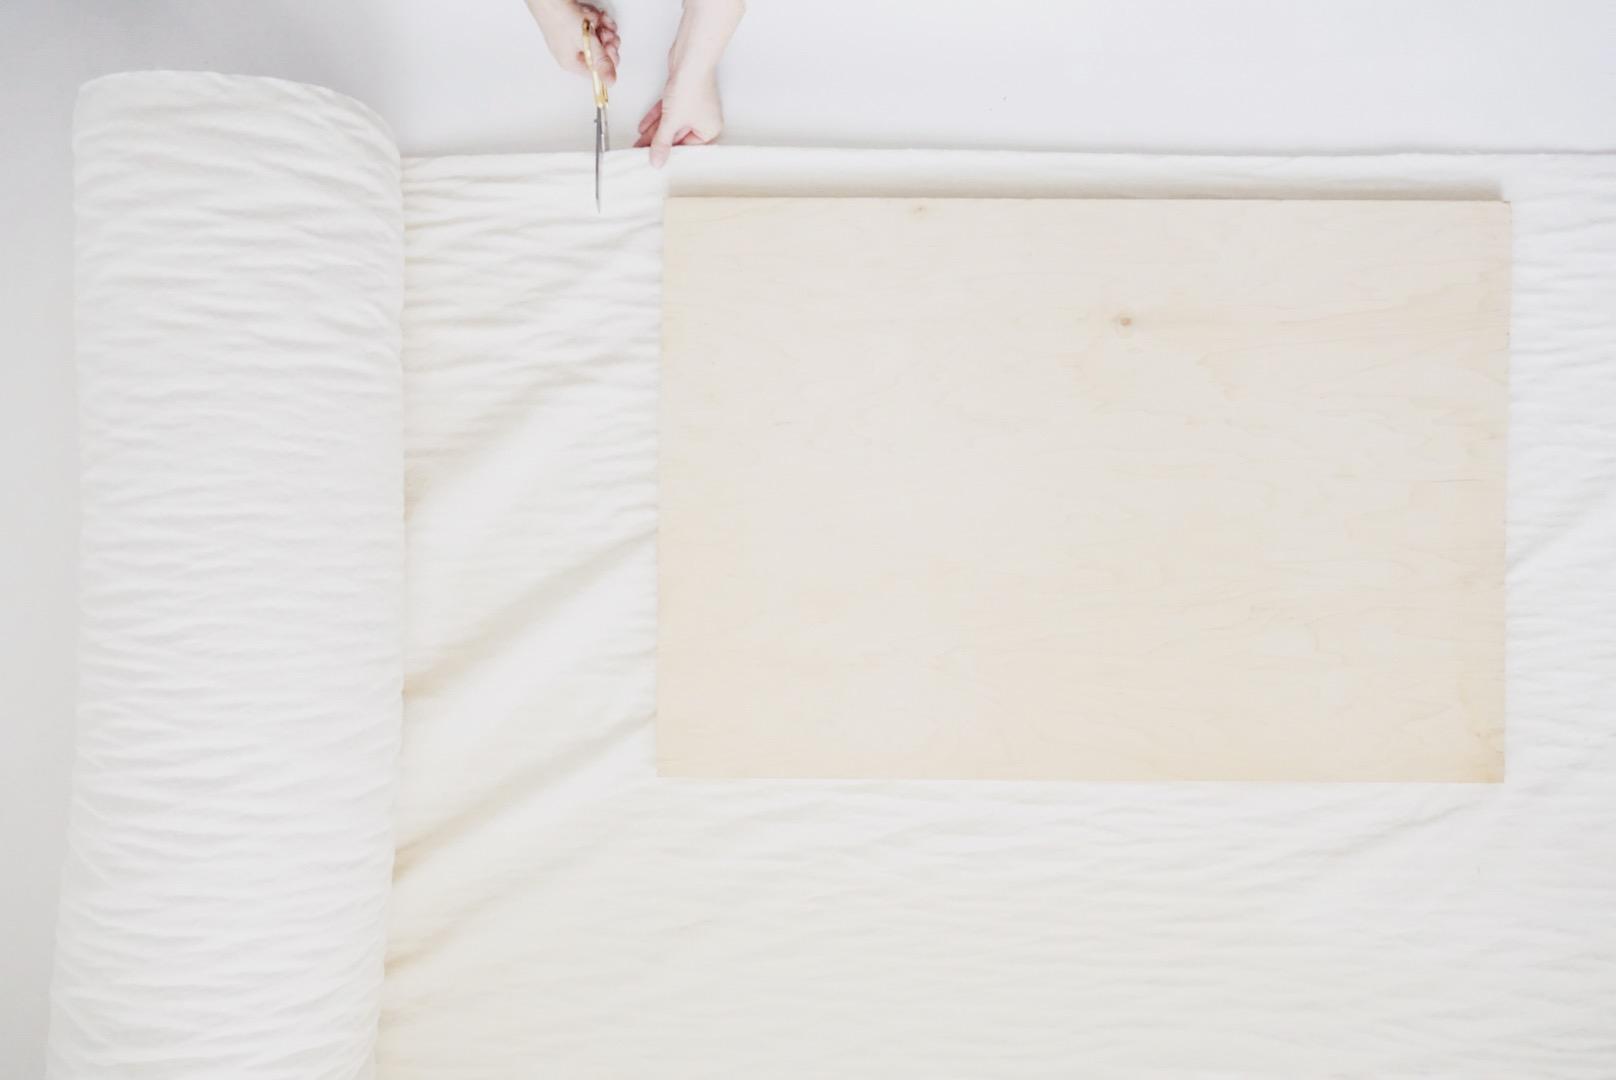 diy-reversible-sequin-fabric-board-4